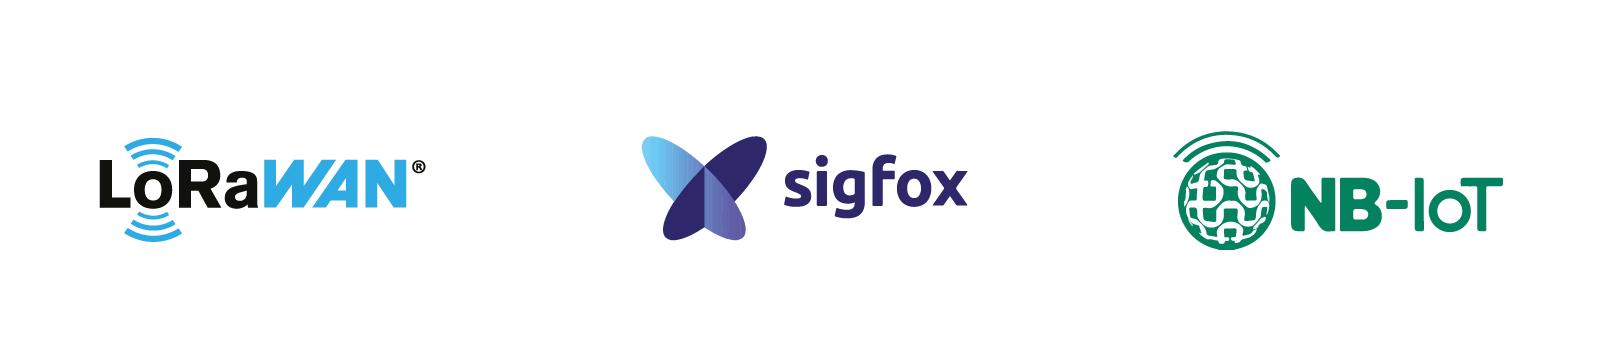 Iot solutions logos